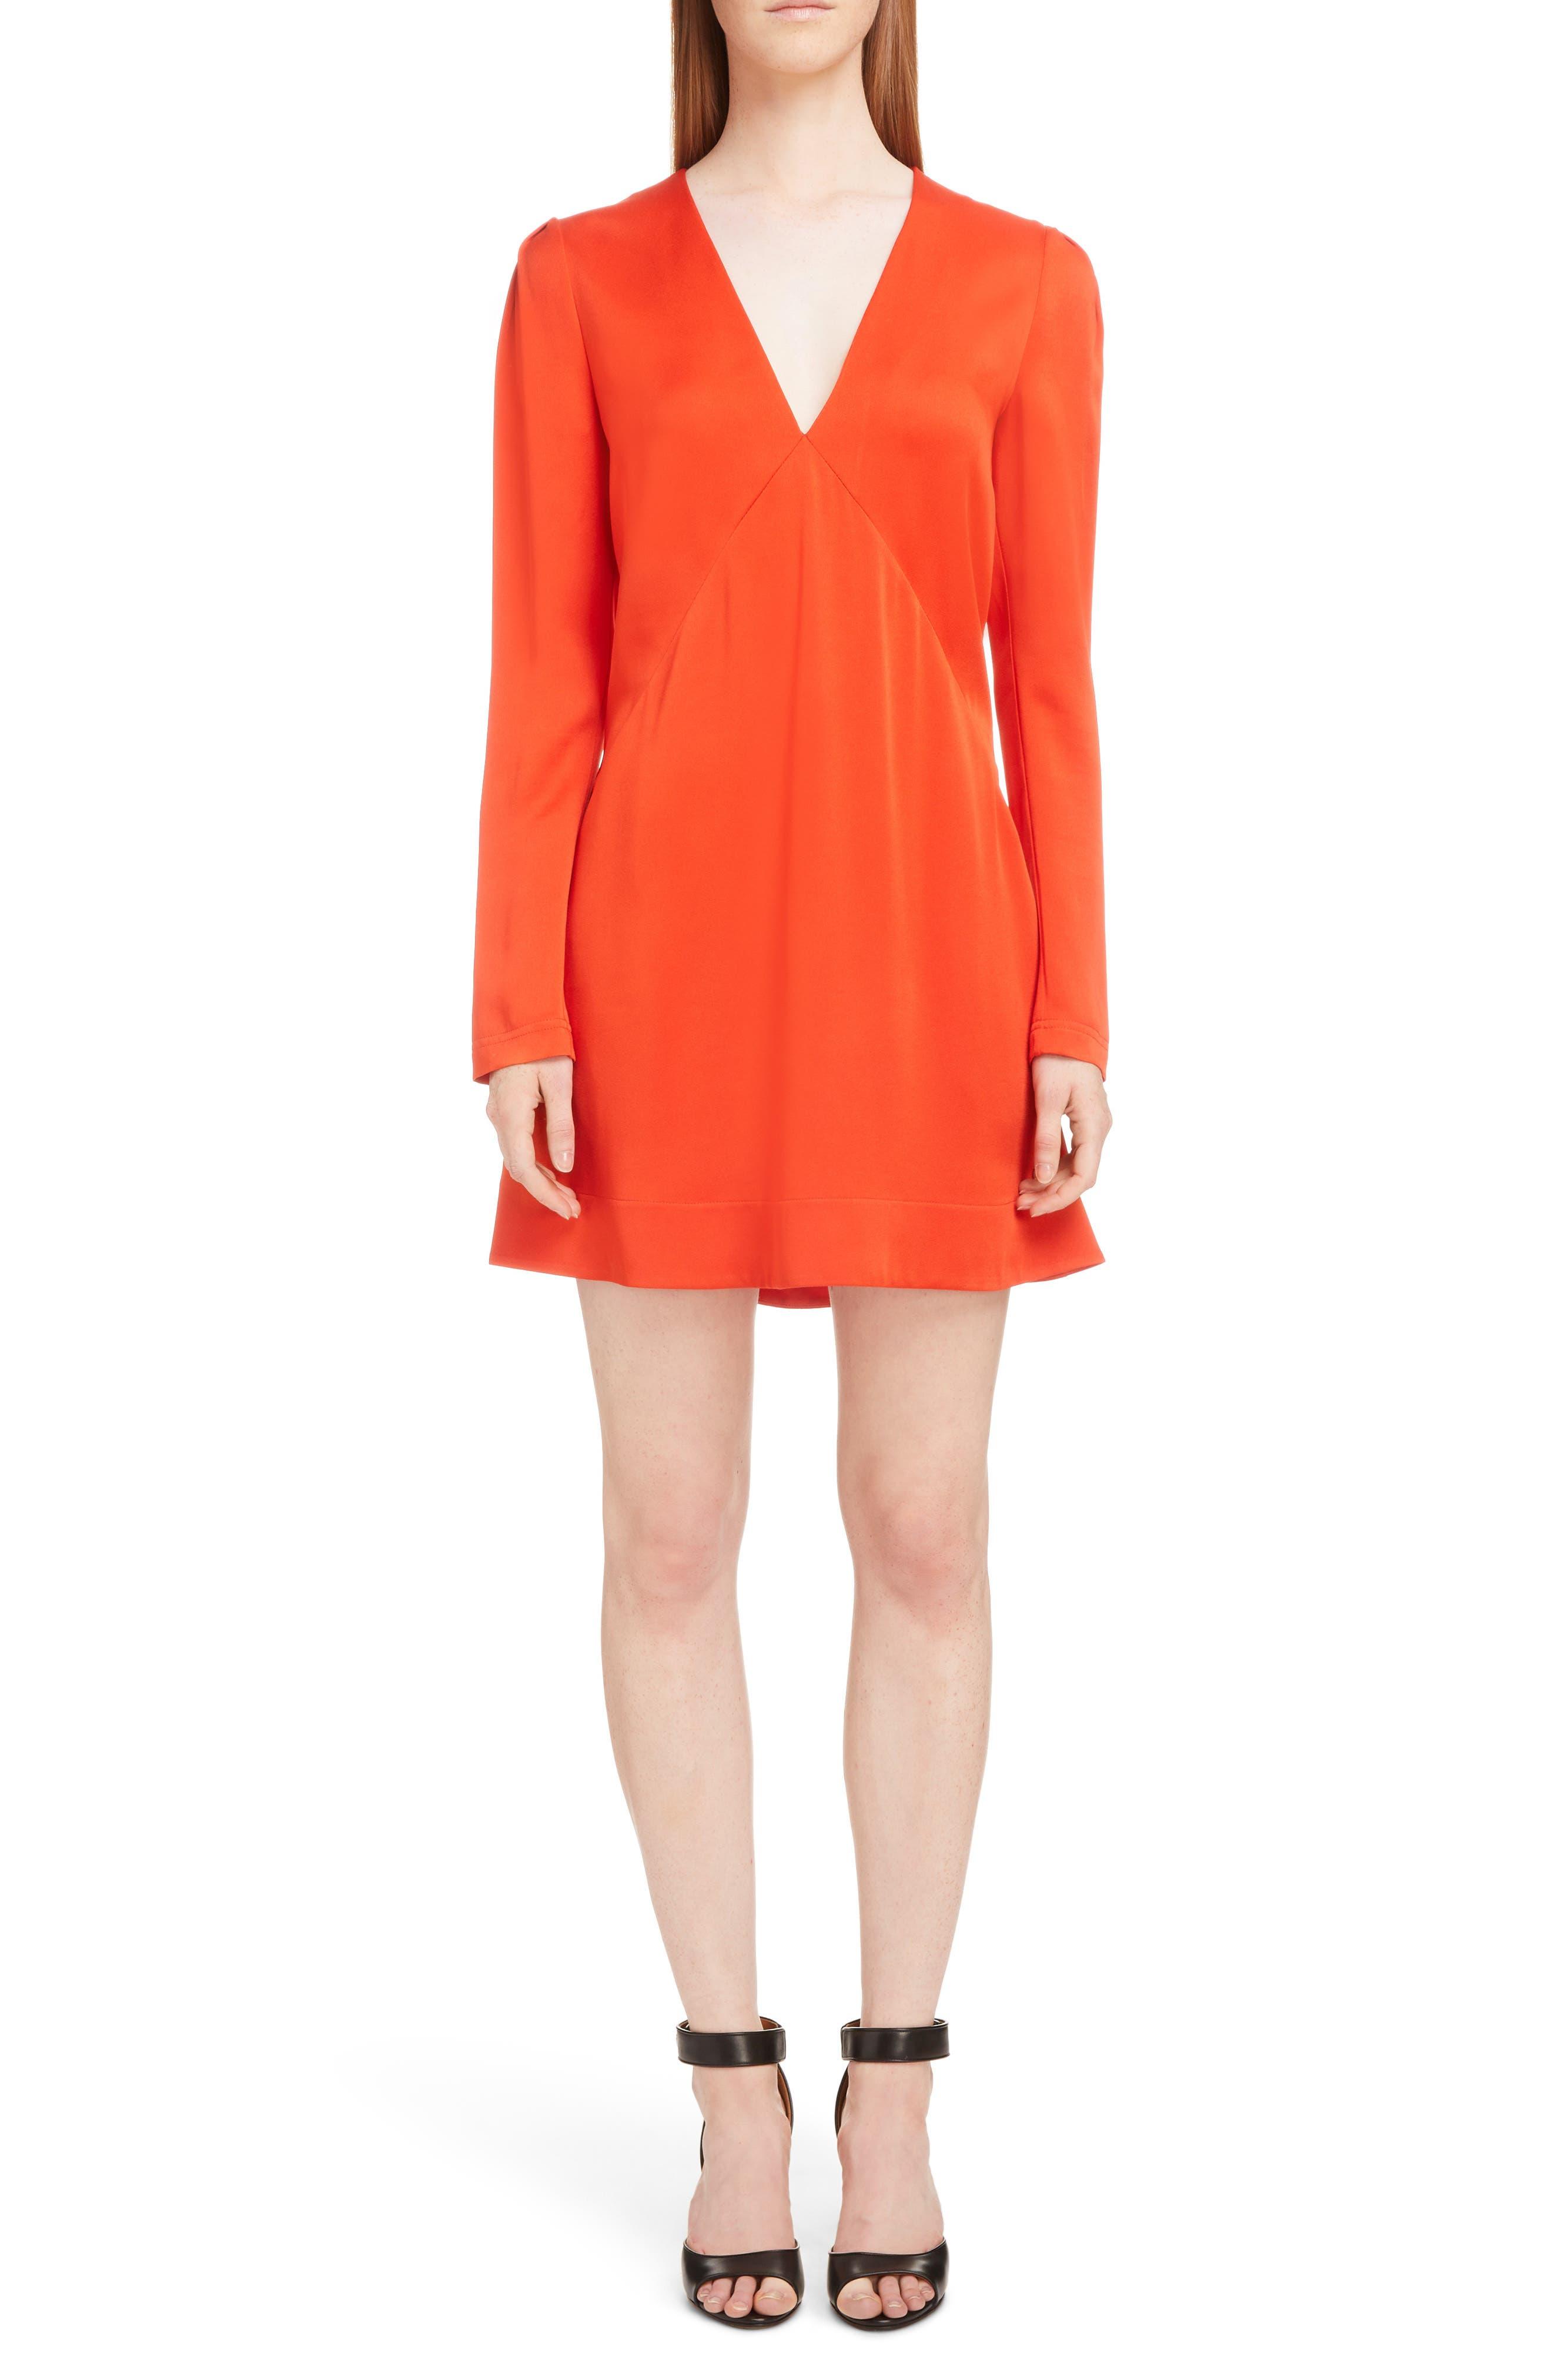 Givenchy Crepe Back Satin Minidress, US / 44 FR - Red